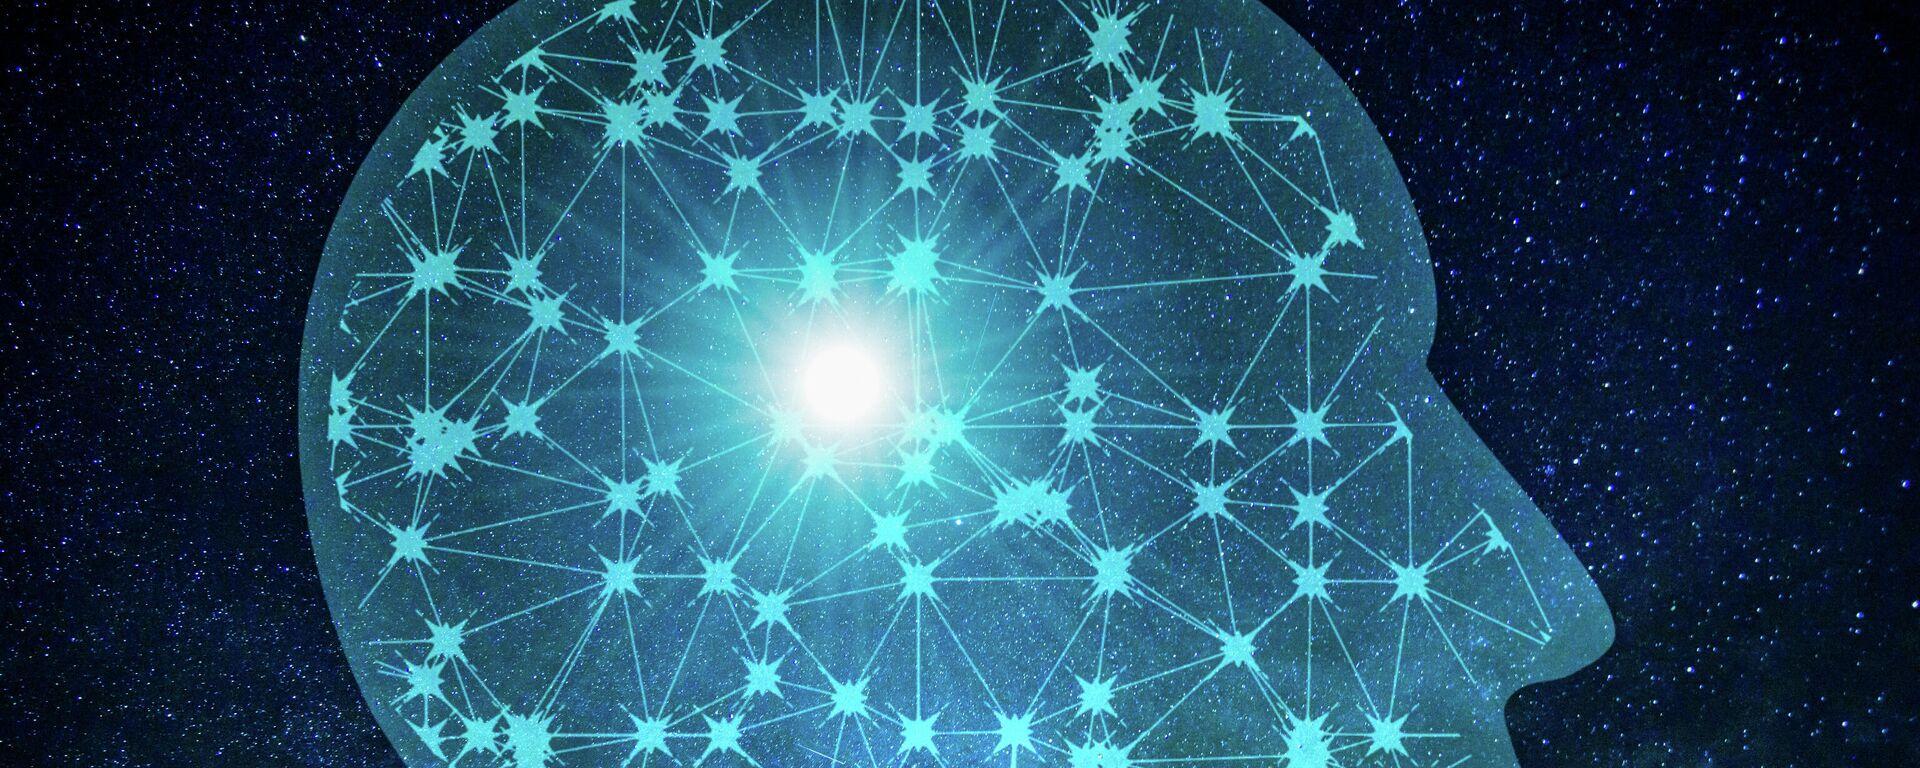 Gehirn (Symbolbild) - SNA, 1920, 22.07.2021